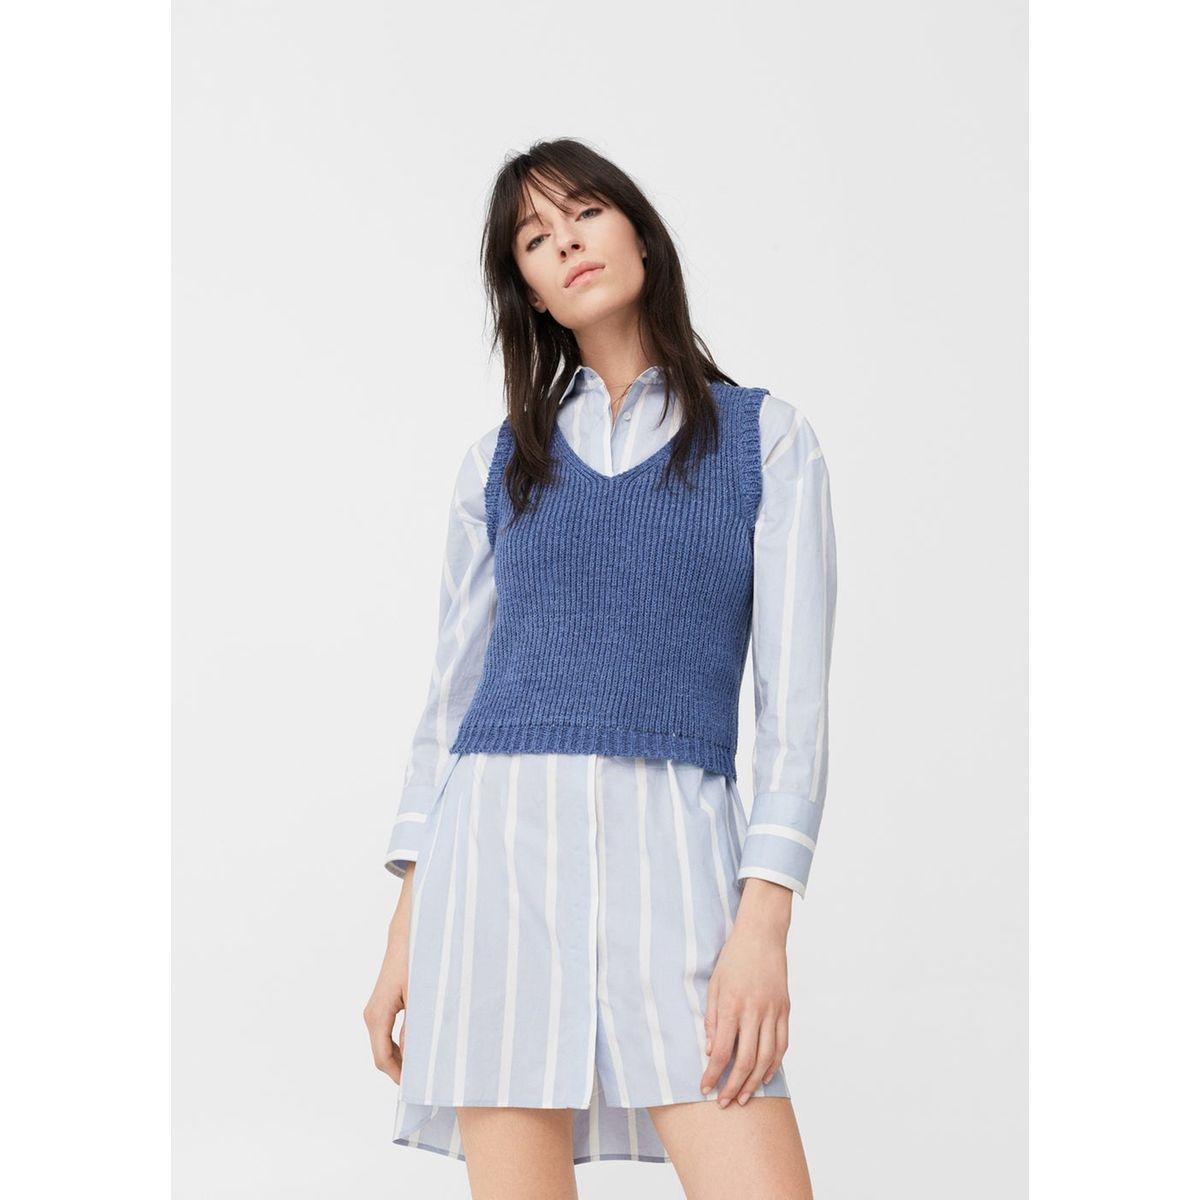 Top maille ouverture - feminin - bleu;rose - mango